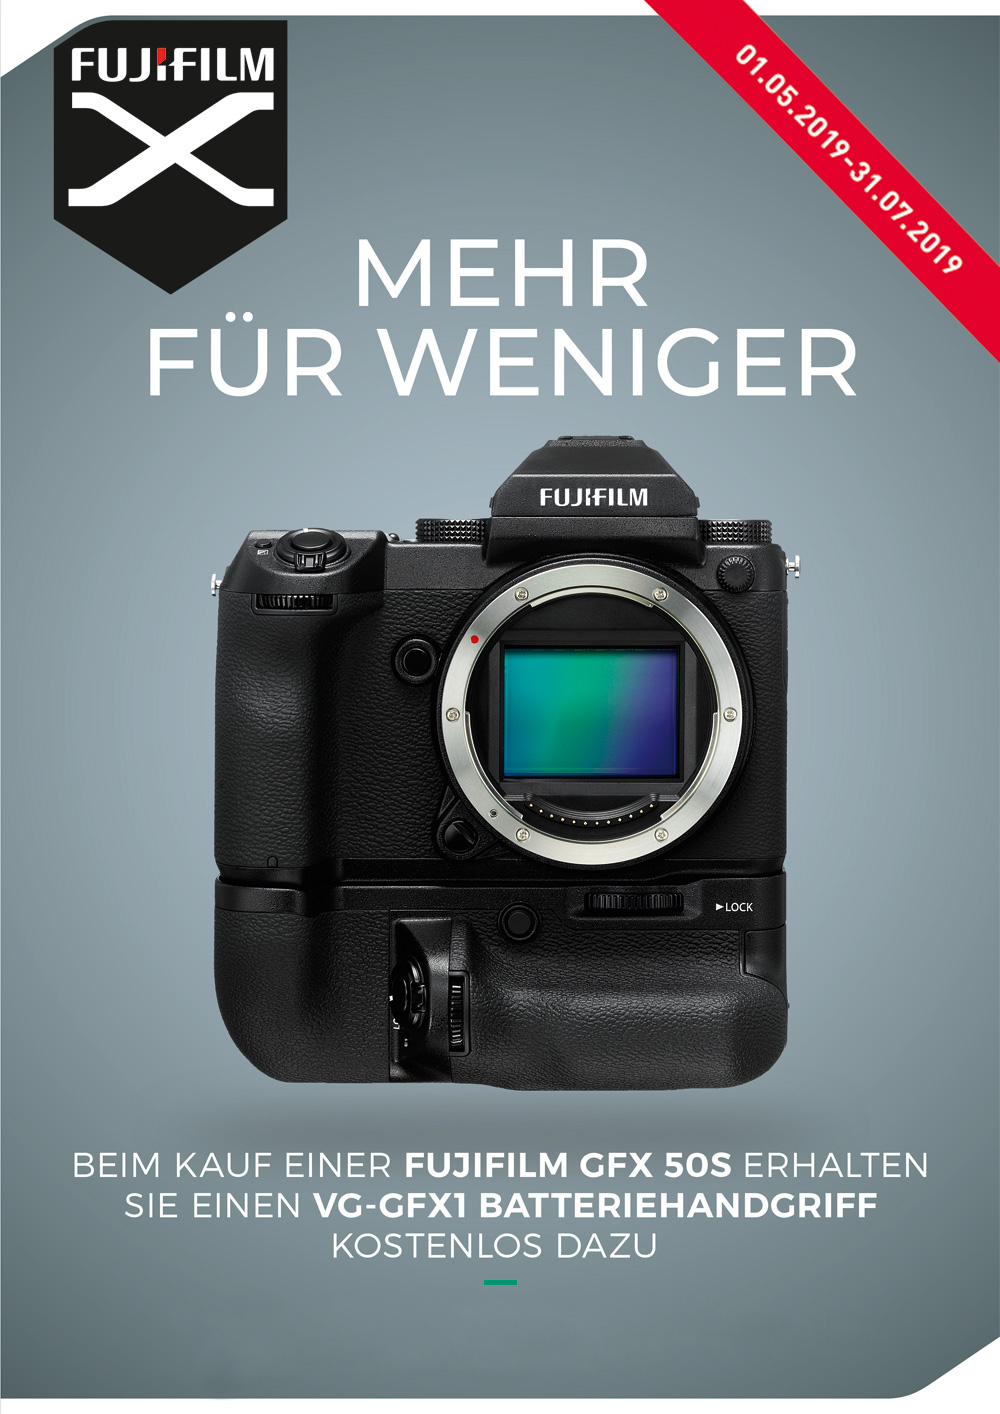 Fujifilm GFX 50S Aktion